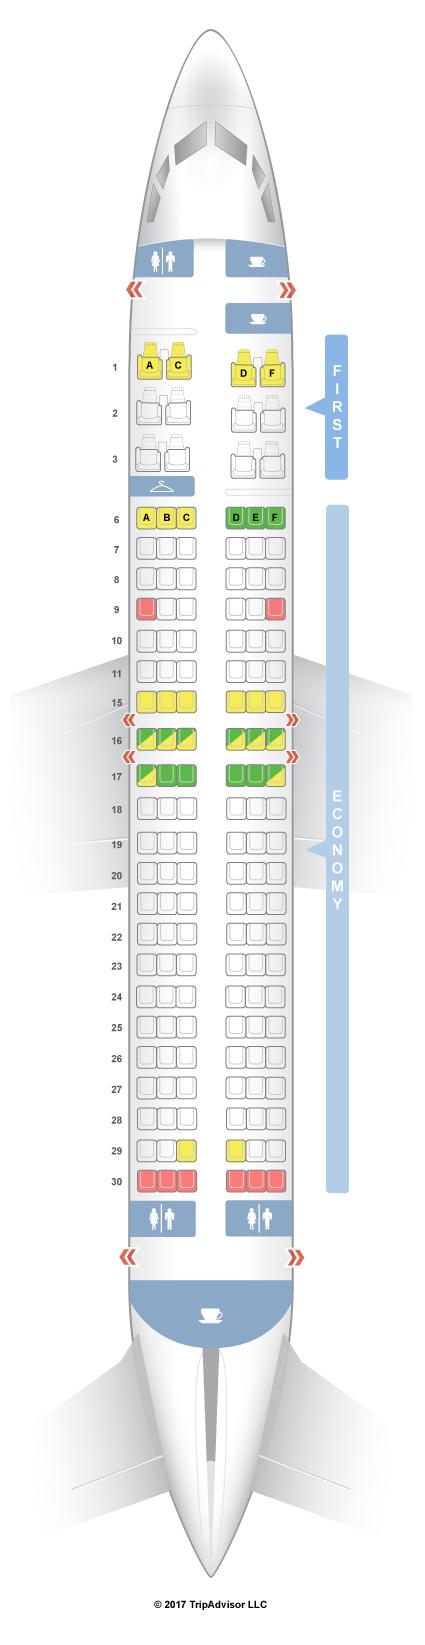 Seatguru Seat Map Alaska Airlines Boeing 737 400 734